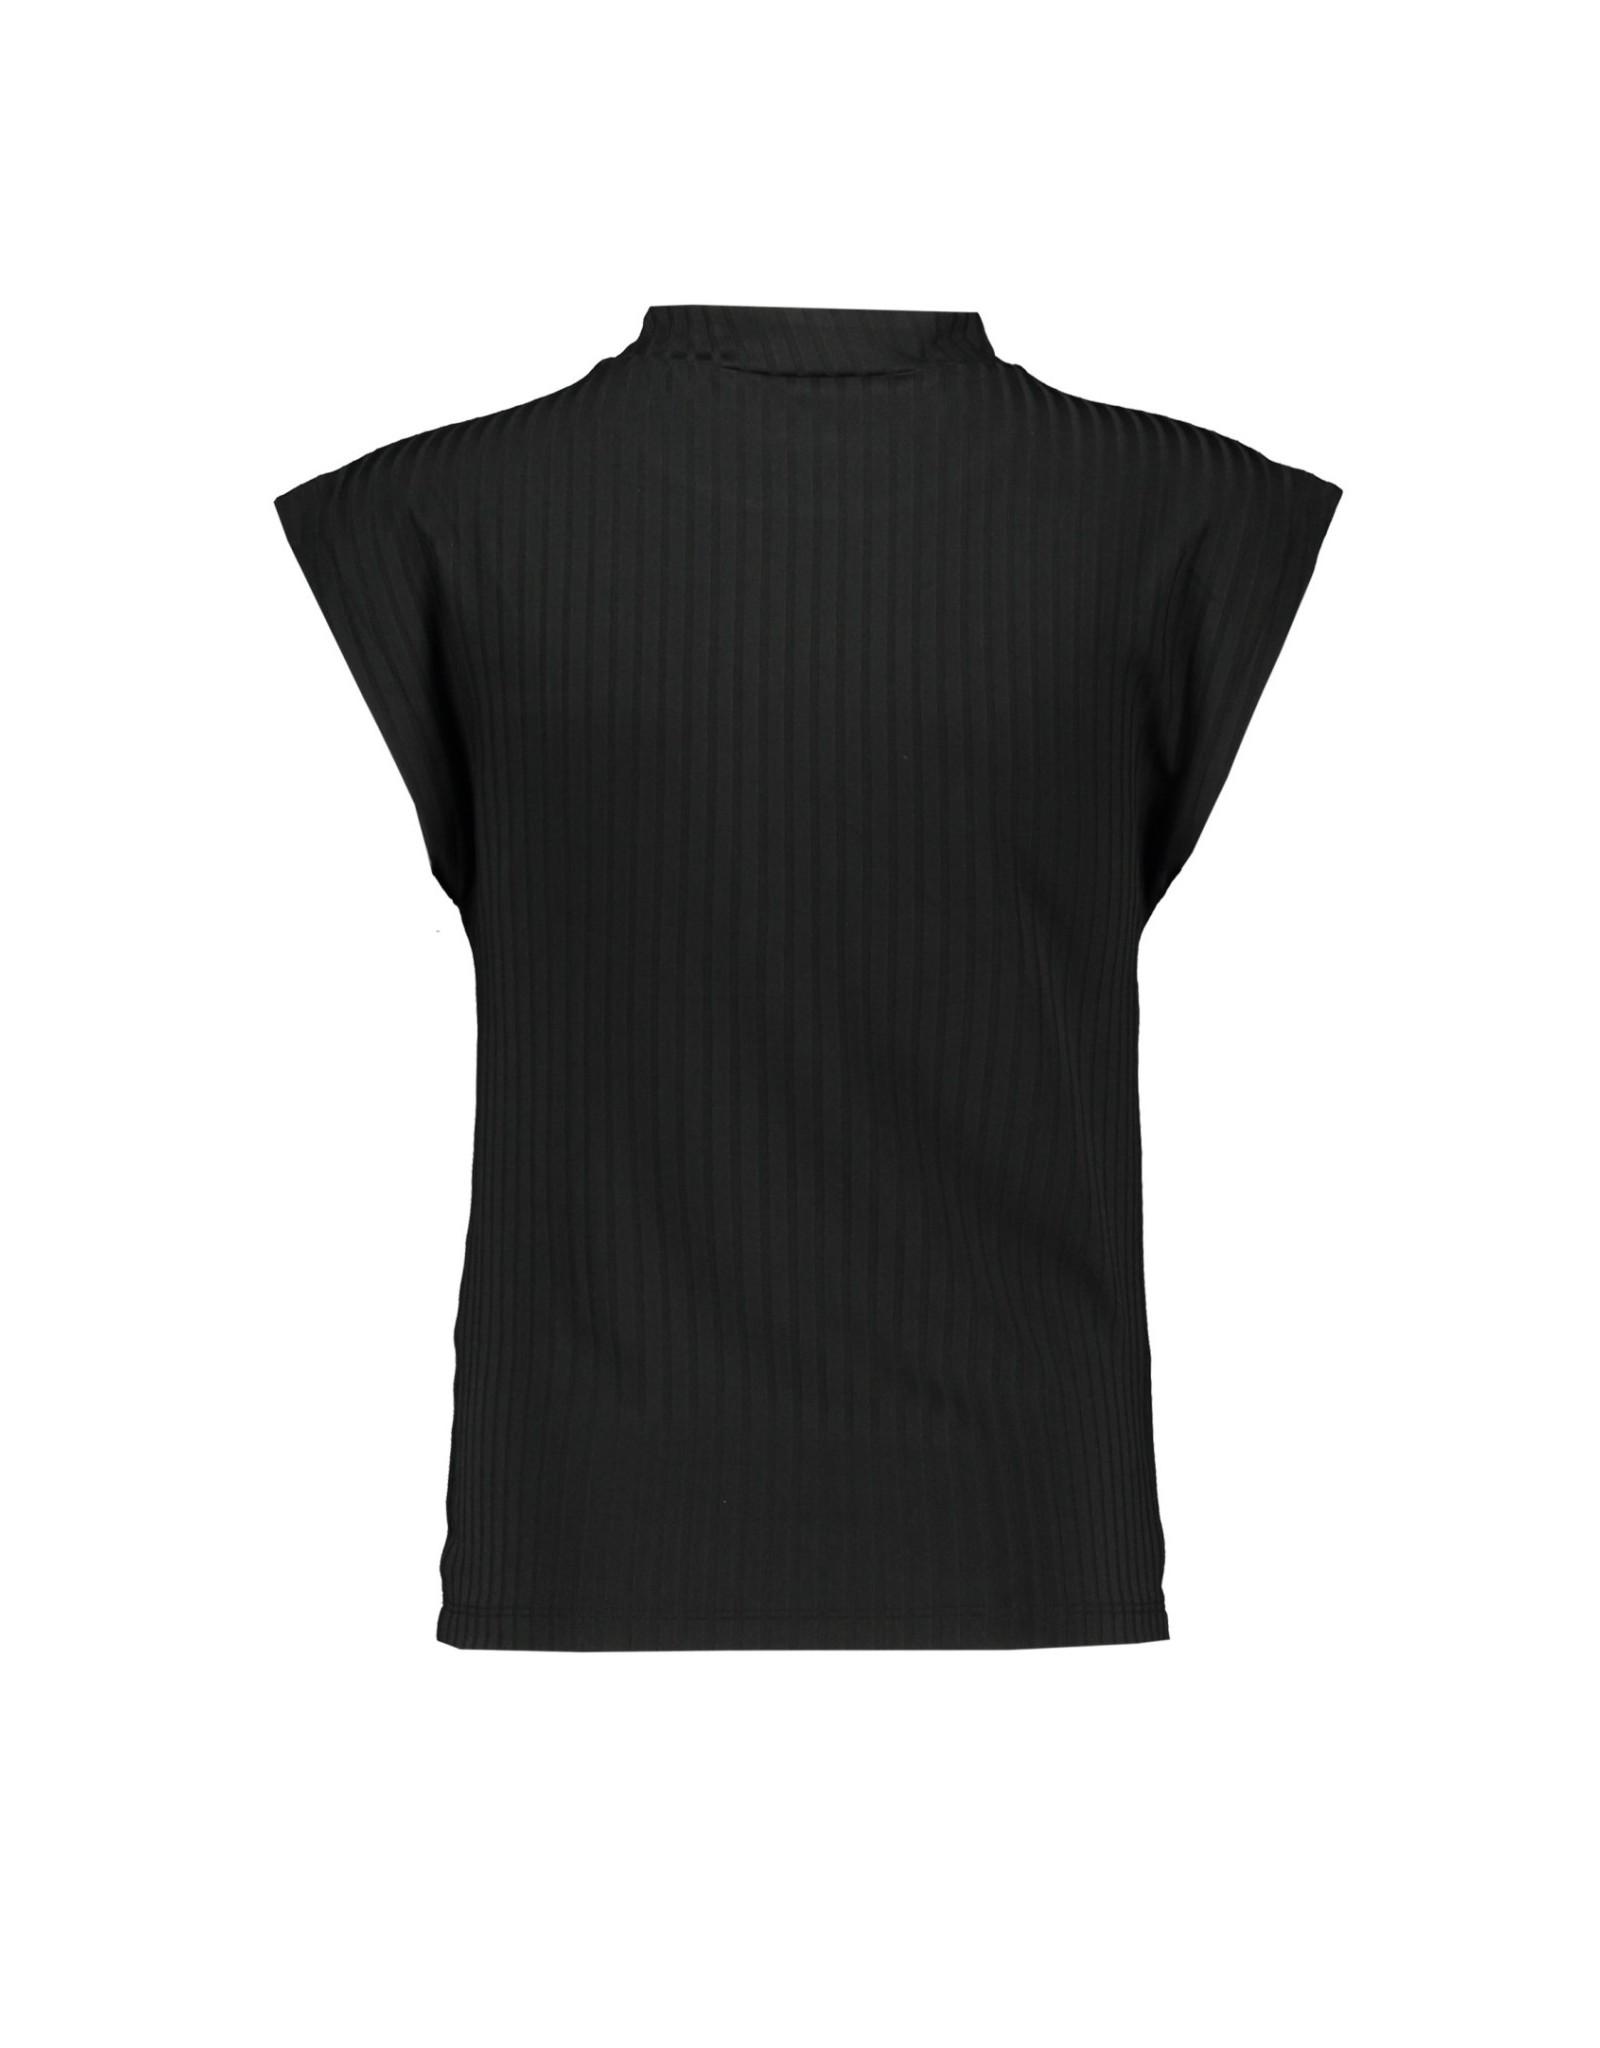 Elle Chic Elle Chic meiden t-shirt Black Mono Stripe